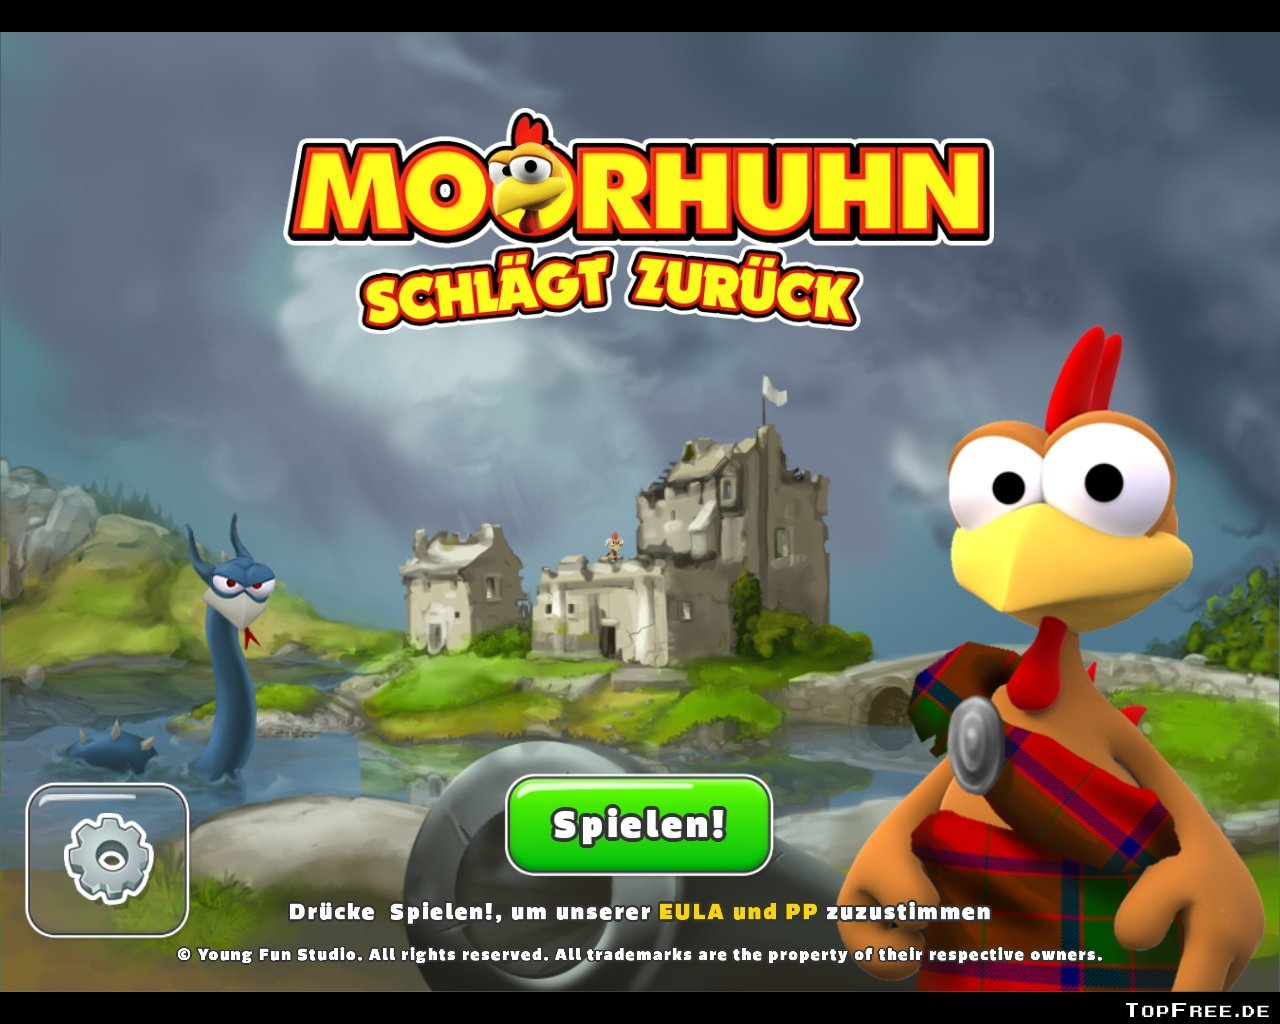 Spiel Moorhuhn